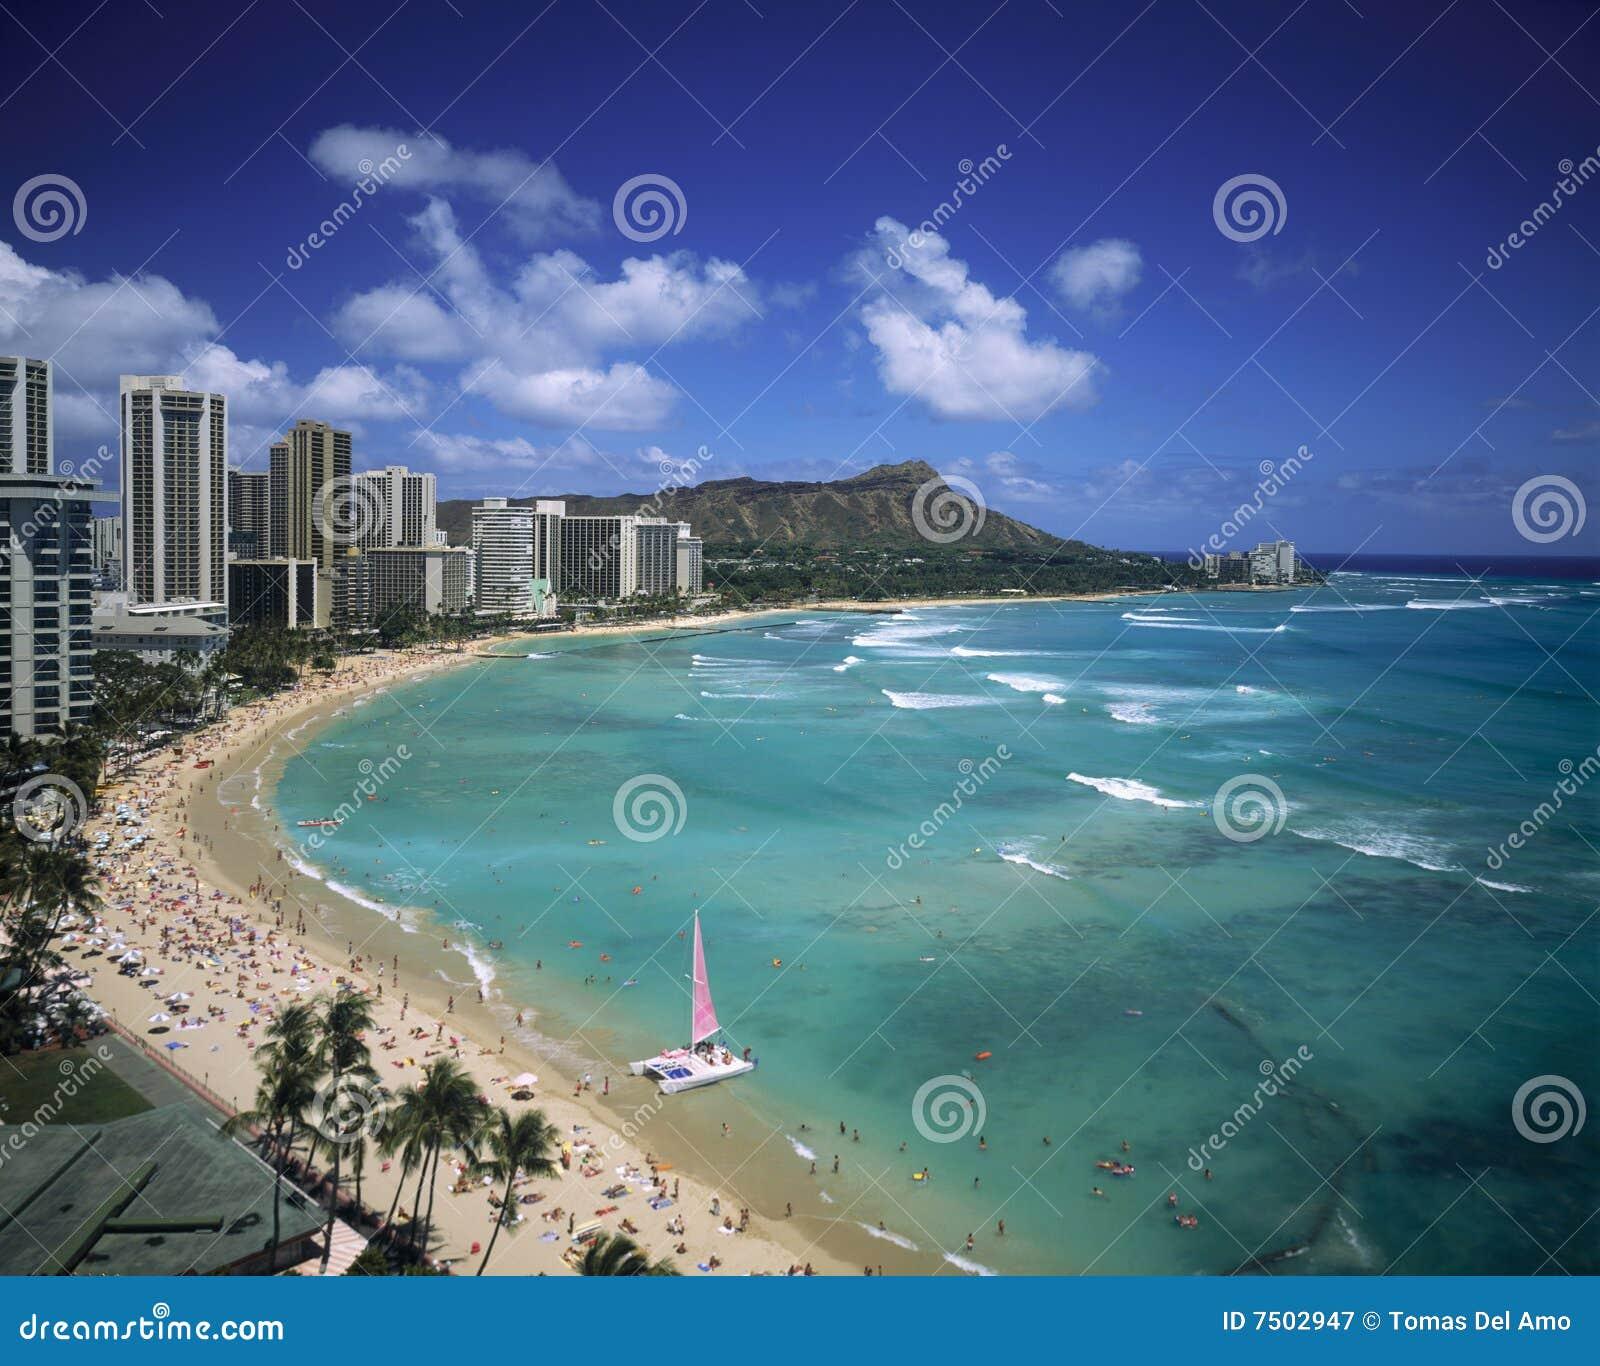 Waikiki Beach Hawaii Stock Image Image Of People Crowd